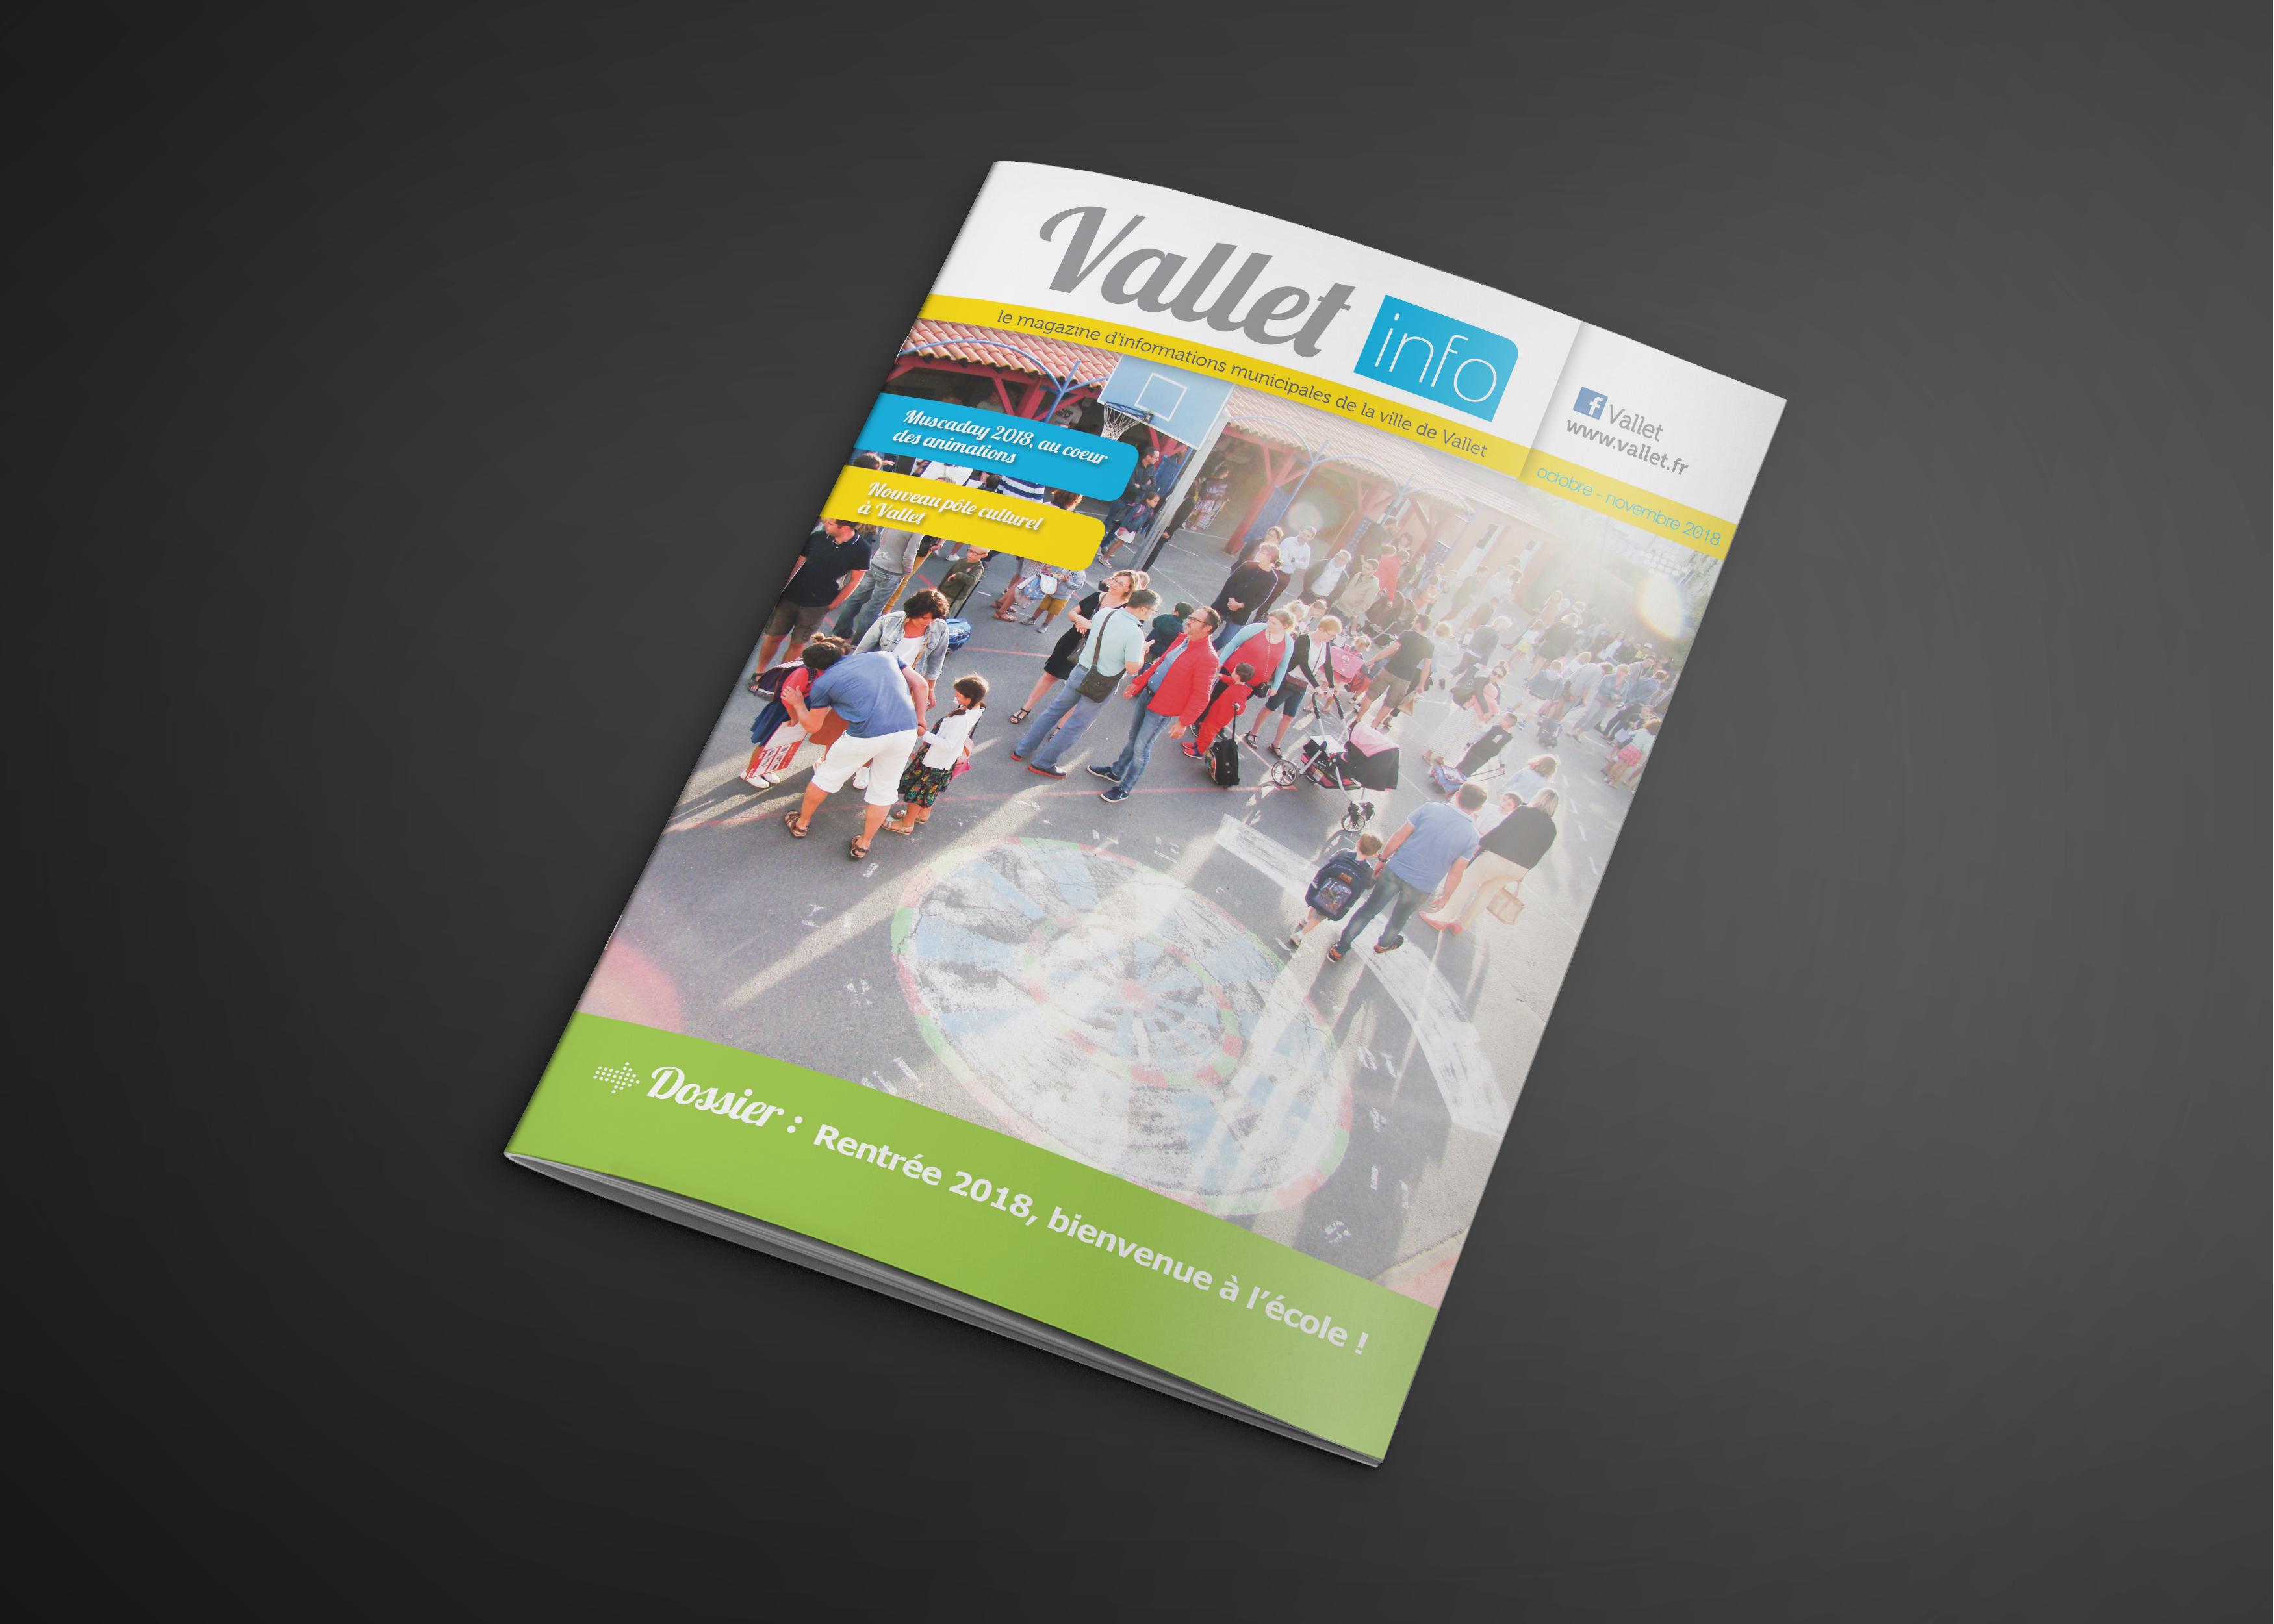 Vallet Info